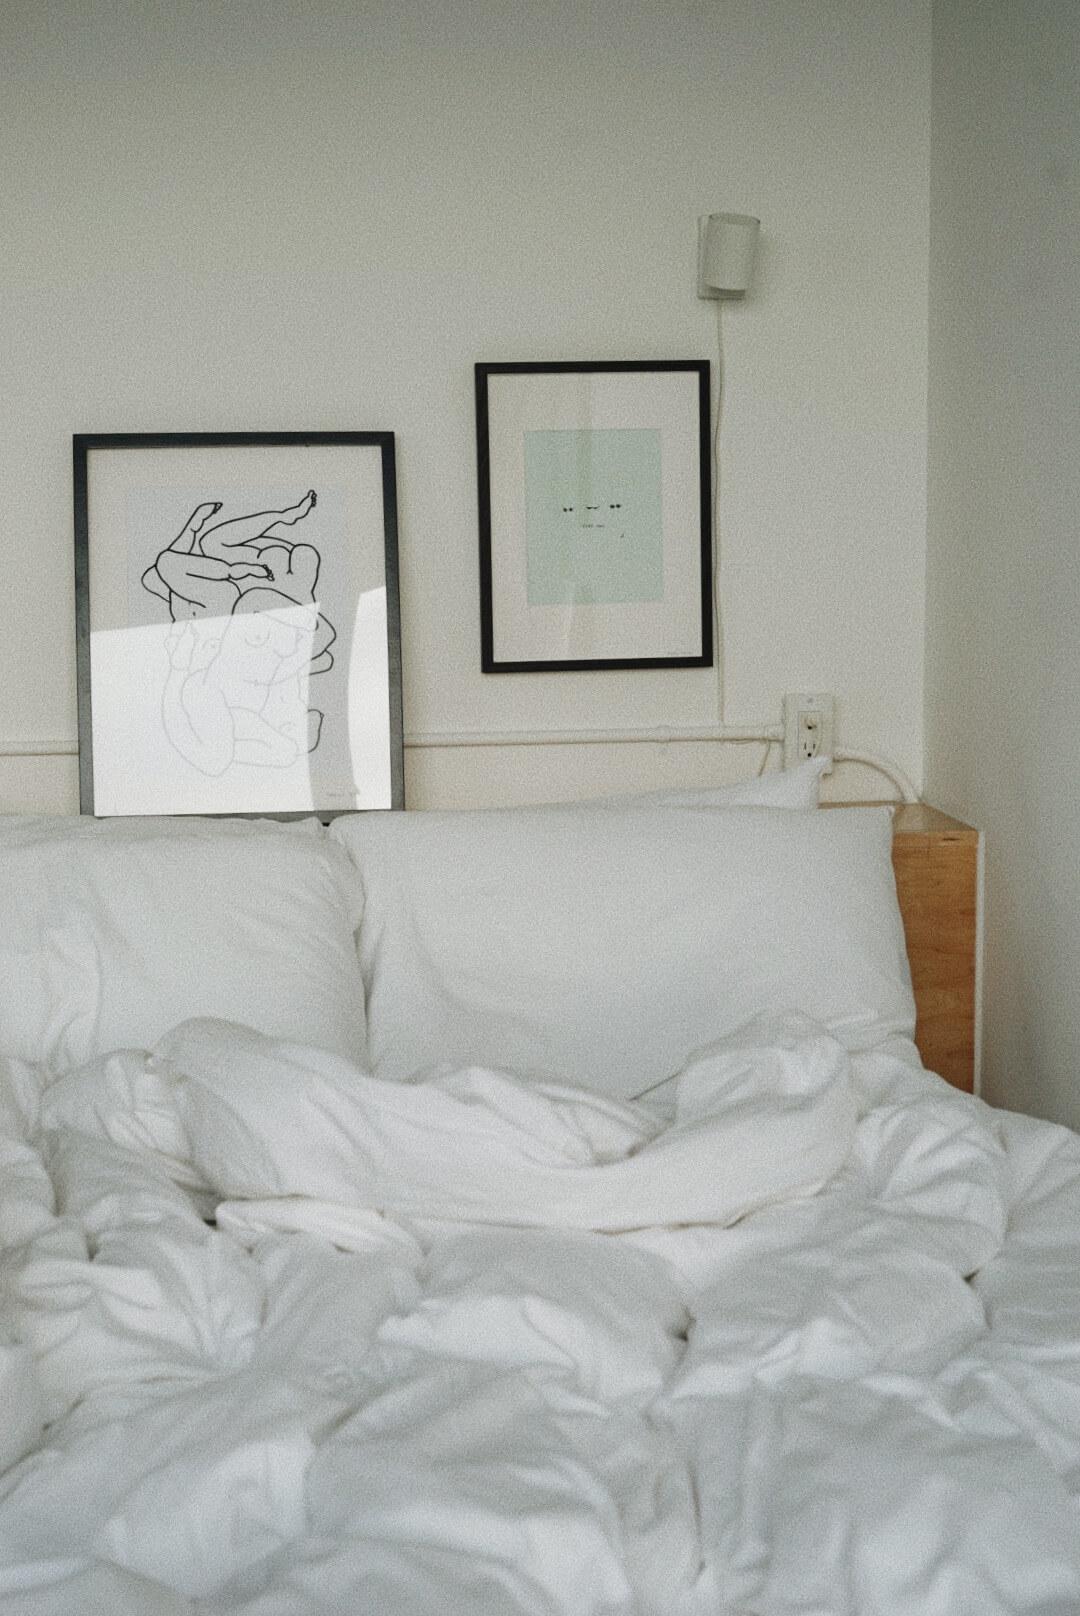 taraleighrose-annex-hotel-toronto-influencer-lifestyle-creator-bed (1).JPG